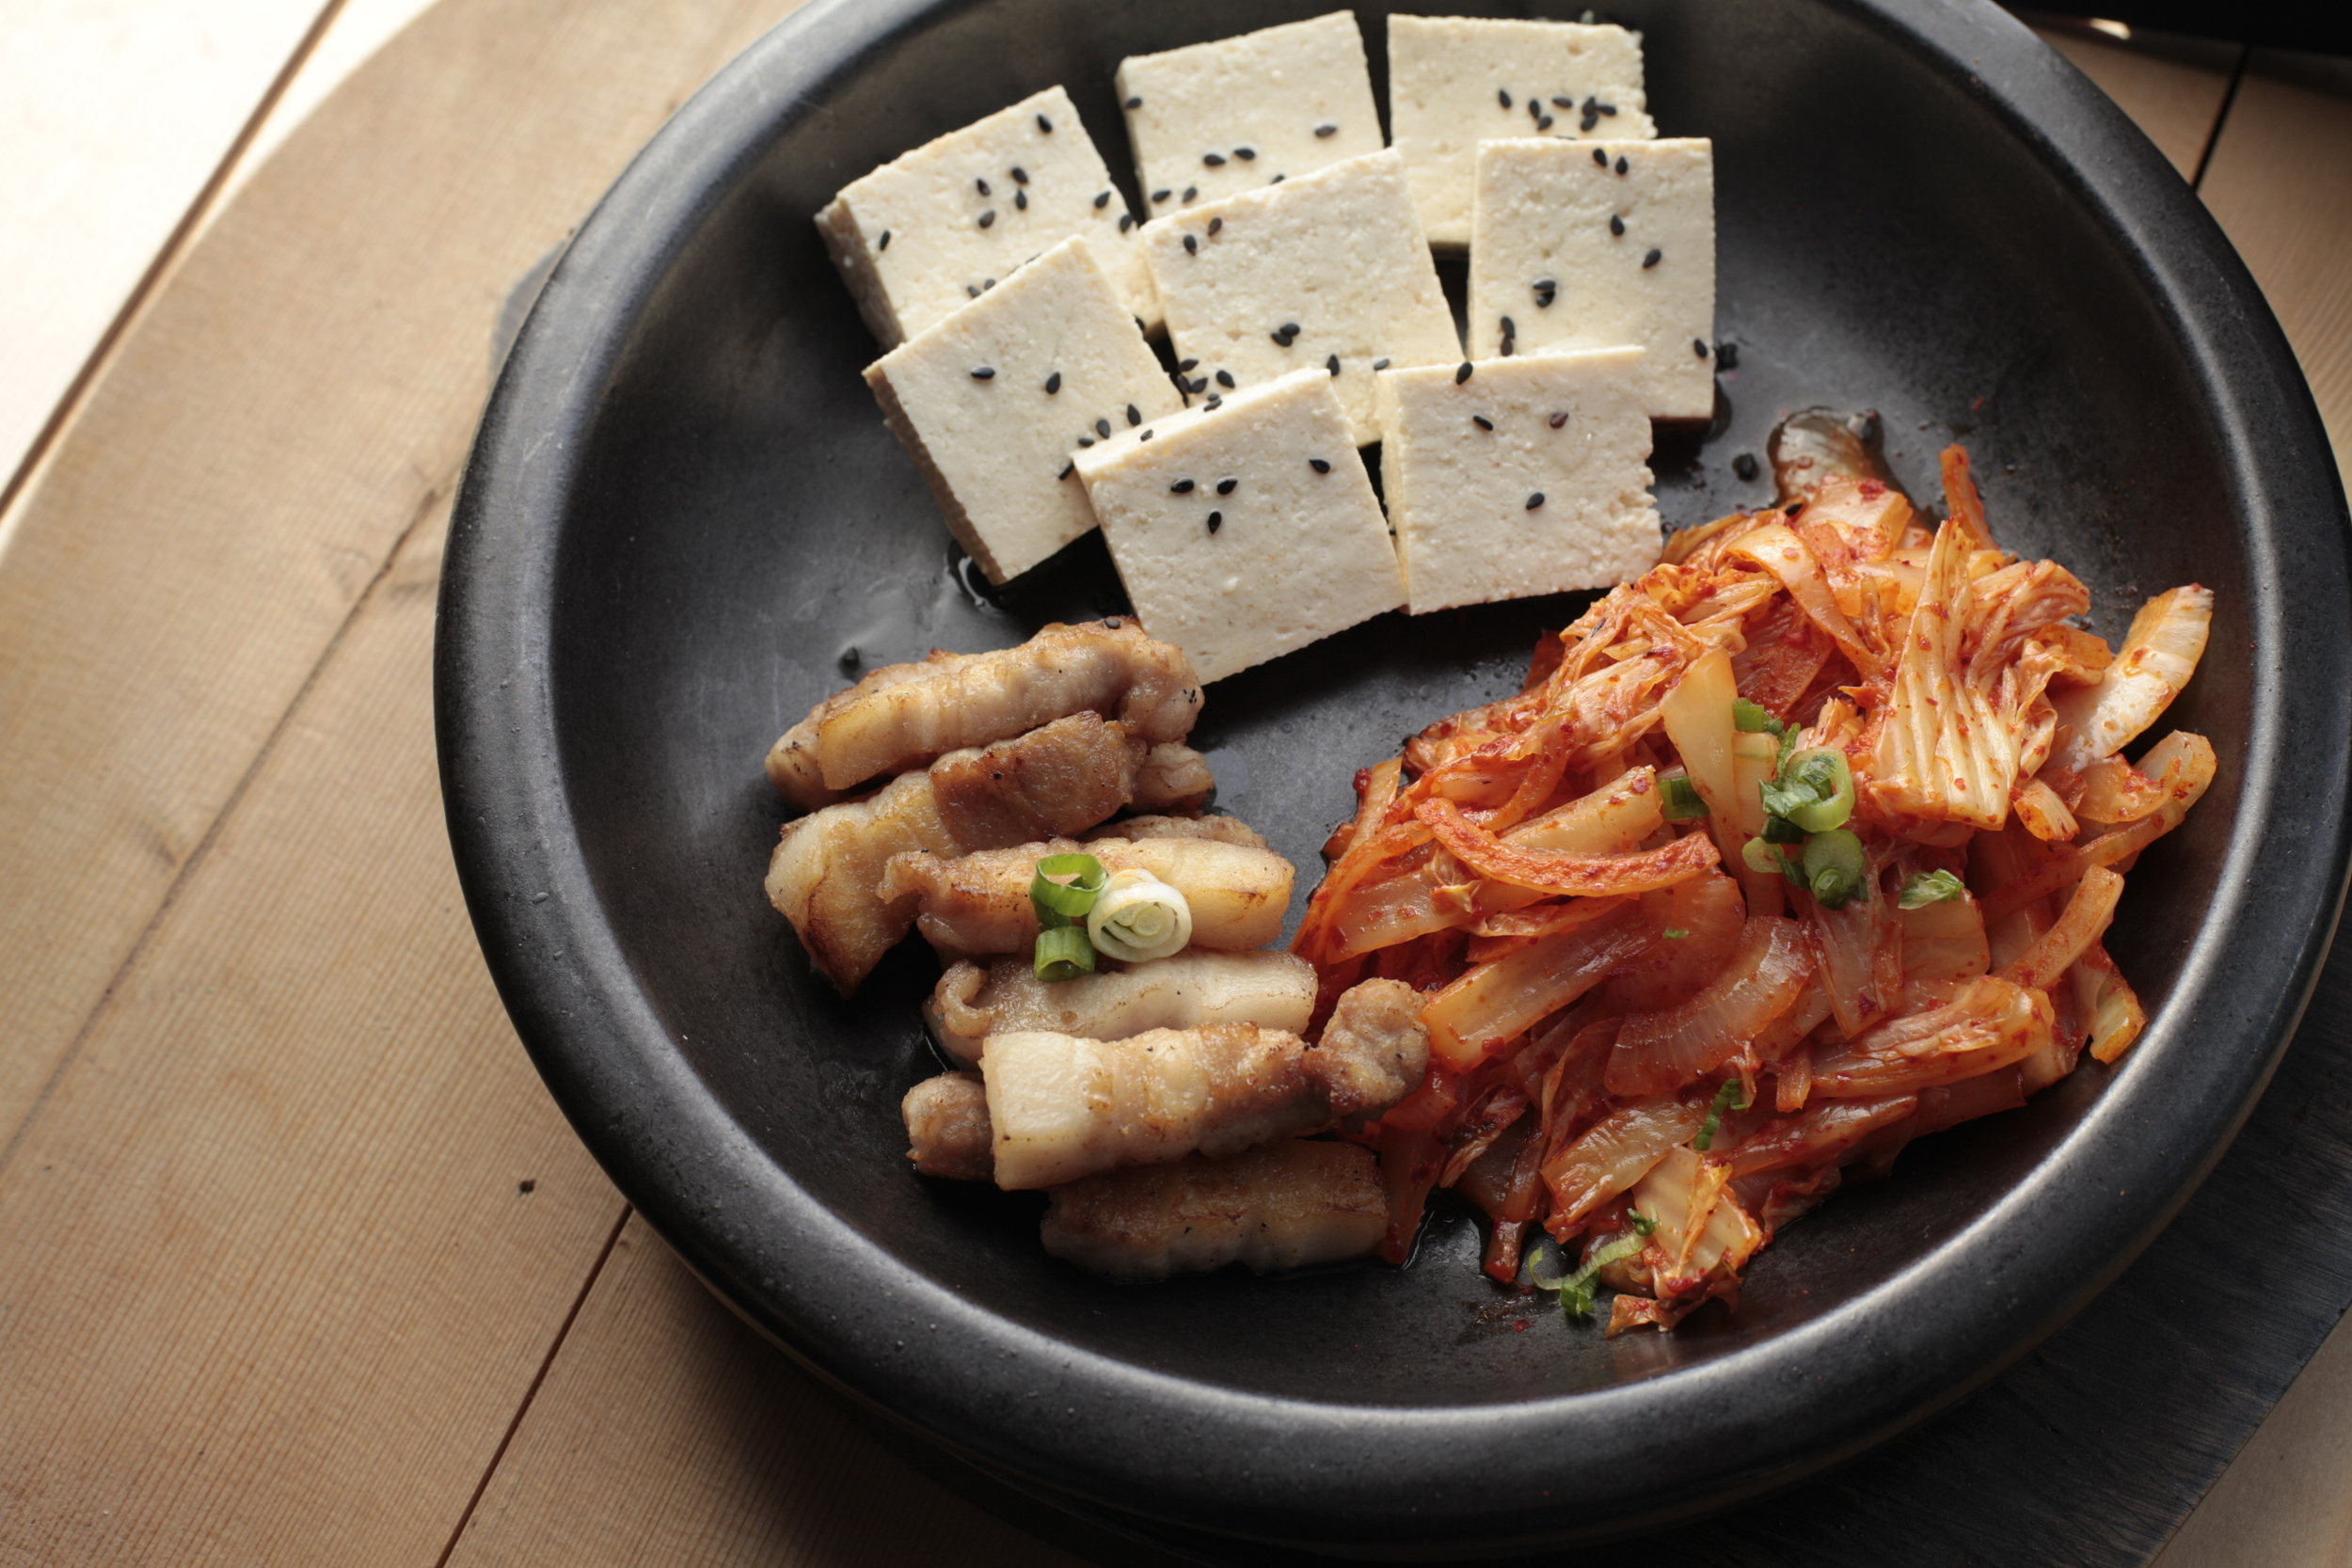 TOFU KIMCHI - Steamed Tofu, Pan-Fried Kimchi